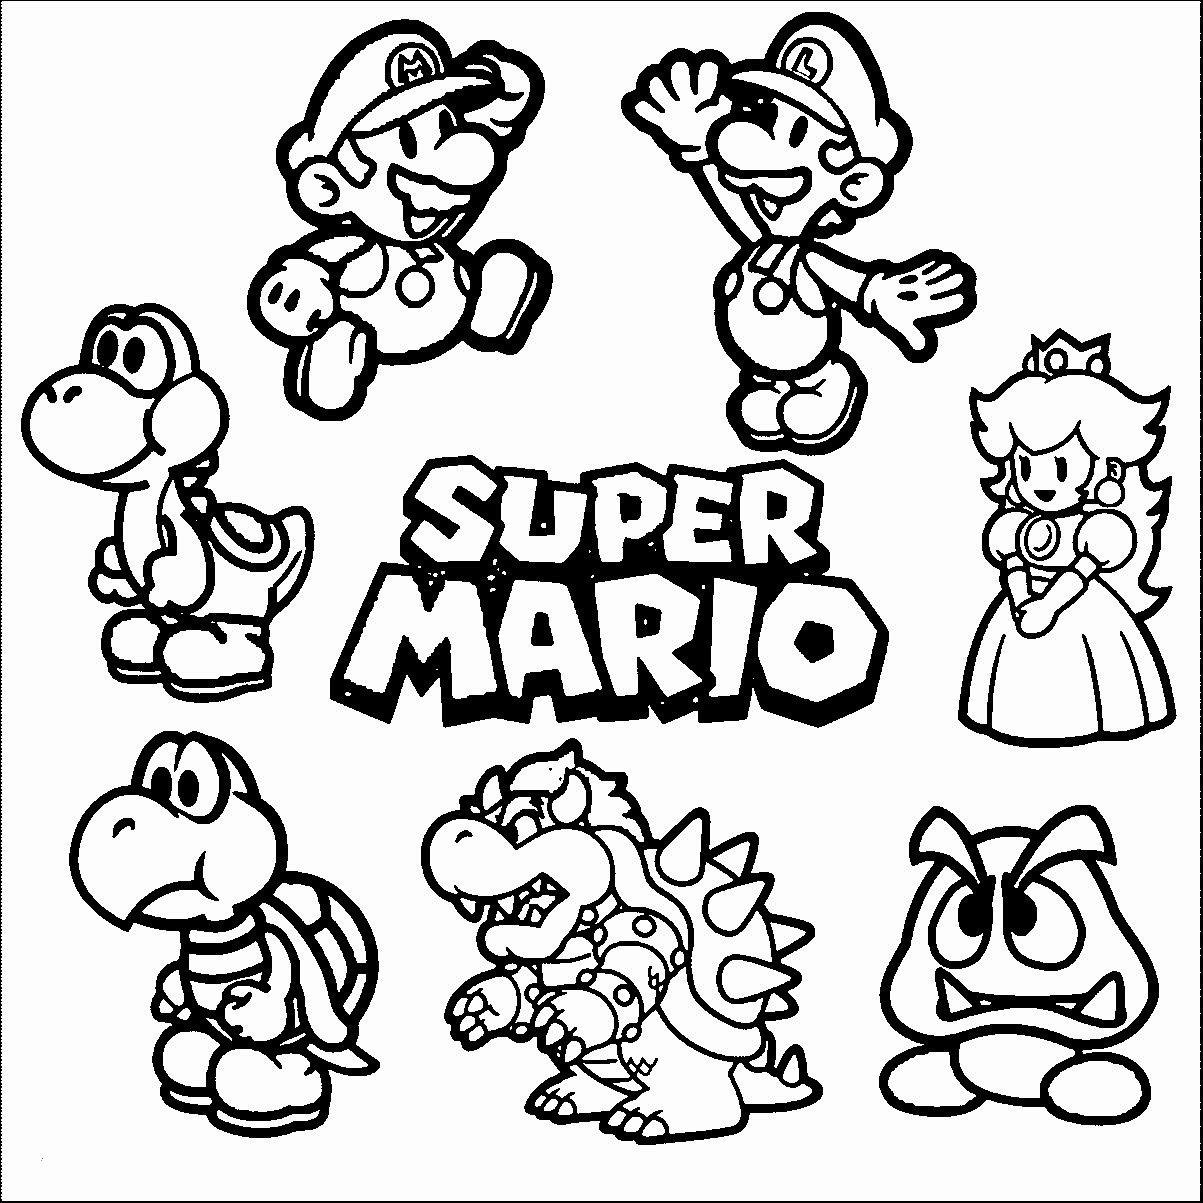 Mario Zum Ausmalen Einzigartig Mario Bros Ausmalbilder Neu Ausmalbilder Mario Bros Schön Bilder